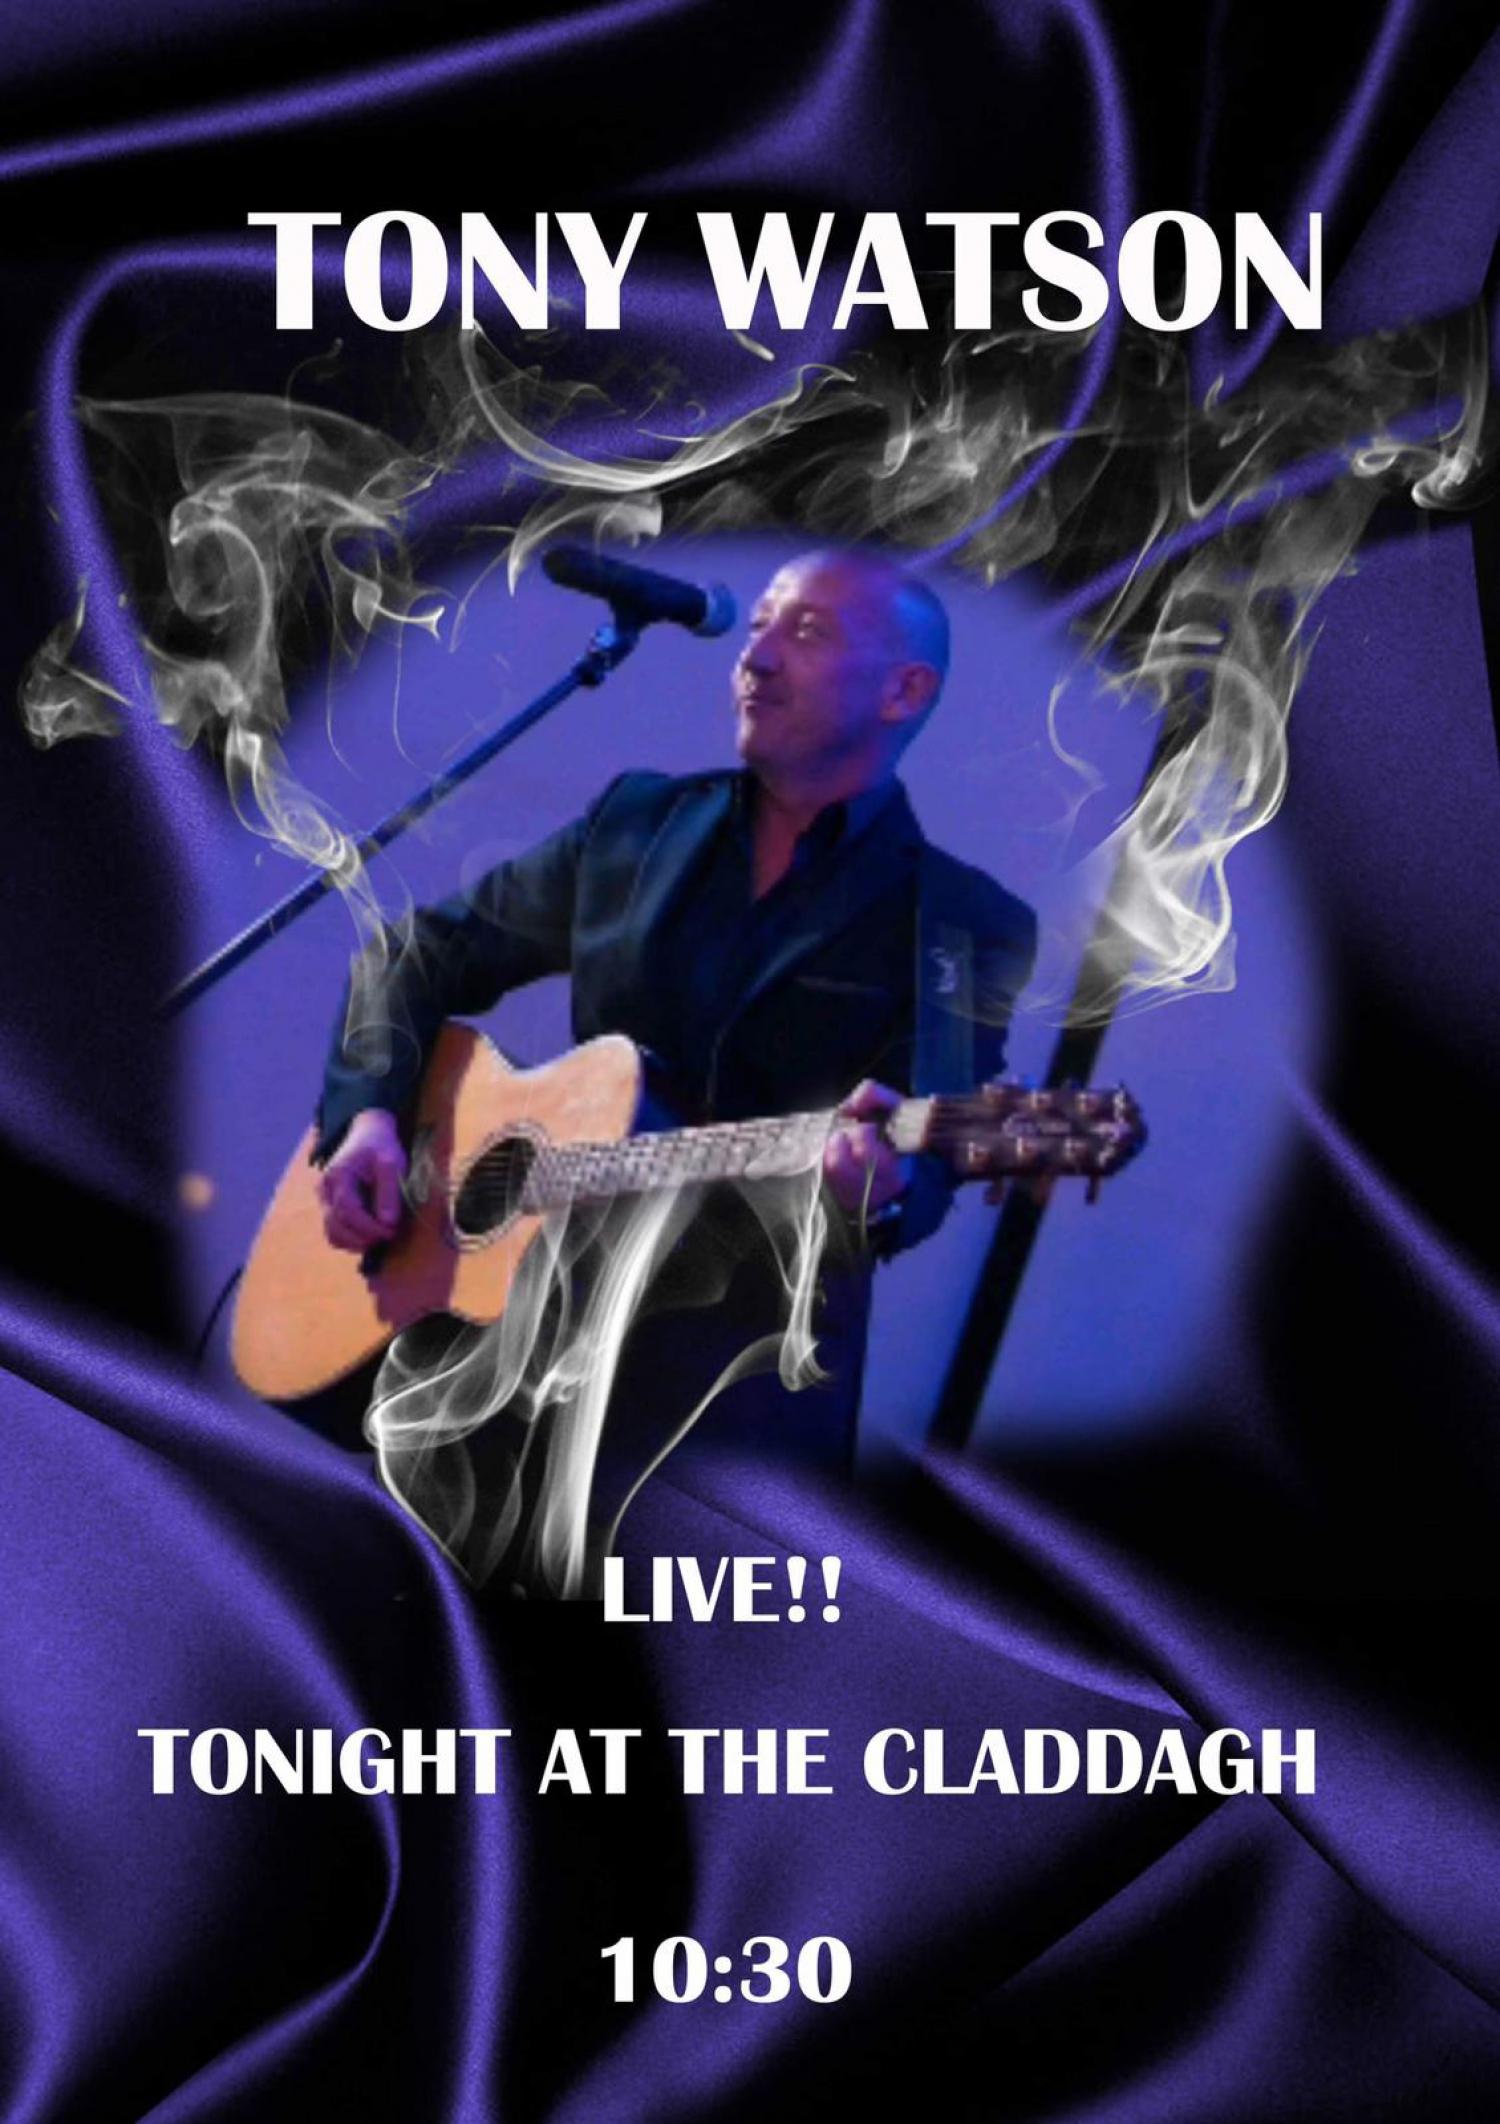 Tony Watson Live at The Claddagh Irish Music Bar